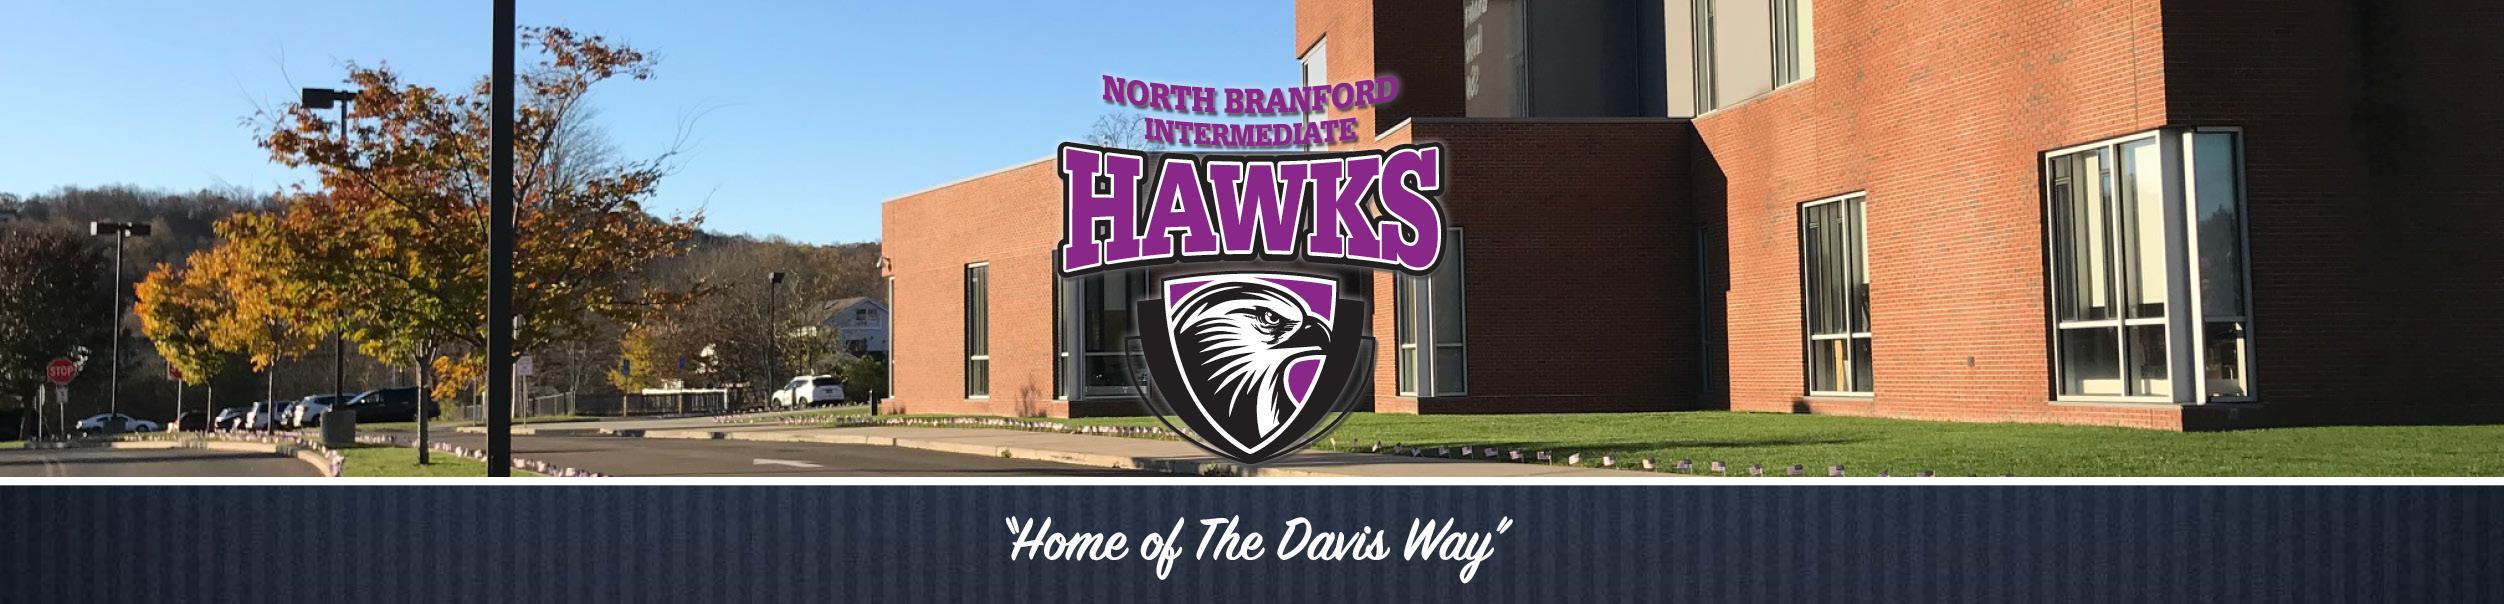 Welcome to North Branford Intermediate School